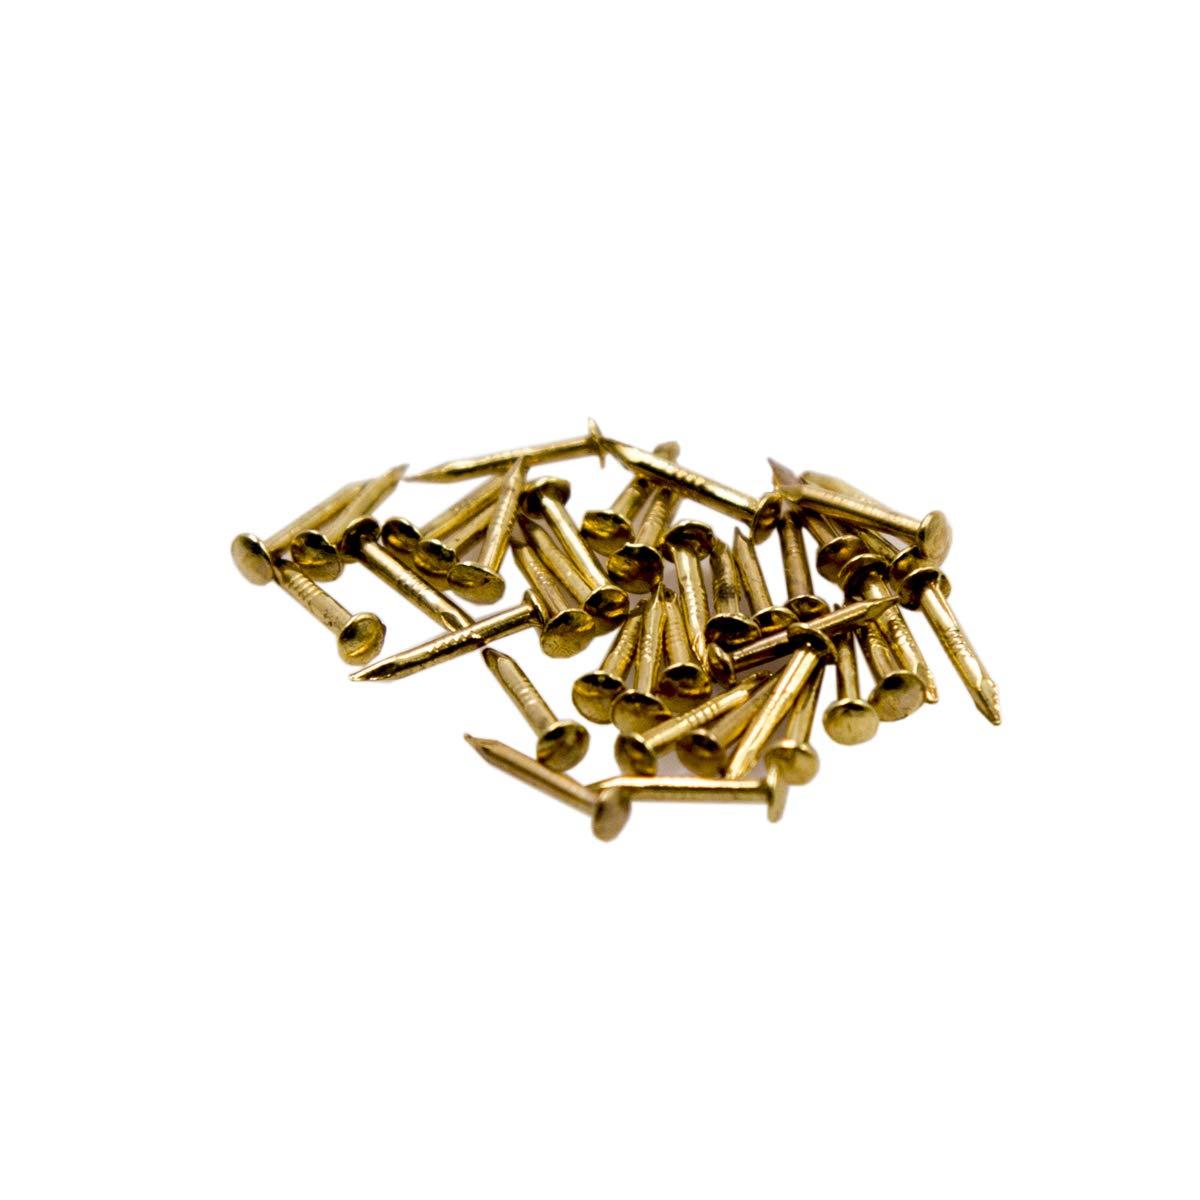 Clavos Peque/ños Tornillos Autorroscantes de Cabeza Redonda Madera Accesorios de Hardware Hechos a Mano Sujetadores 500PCS 1 X 10 mm Bronce